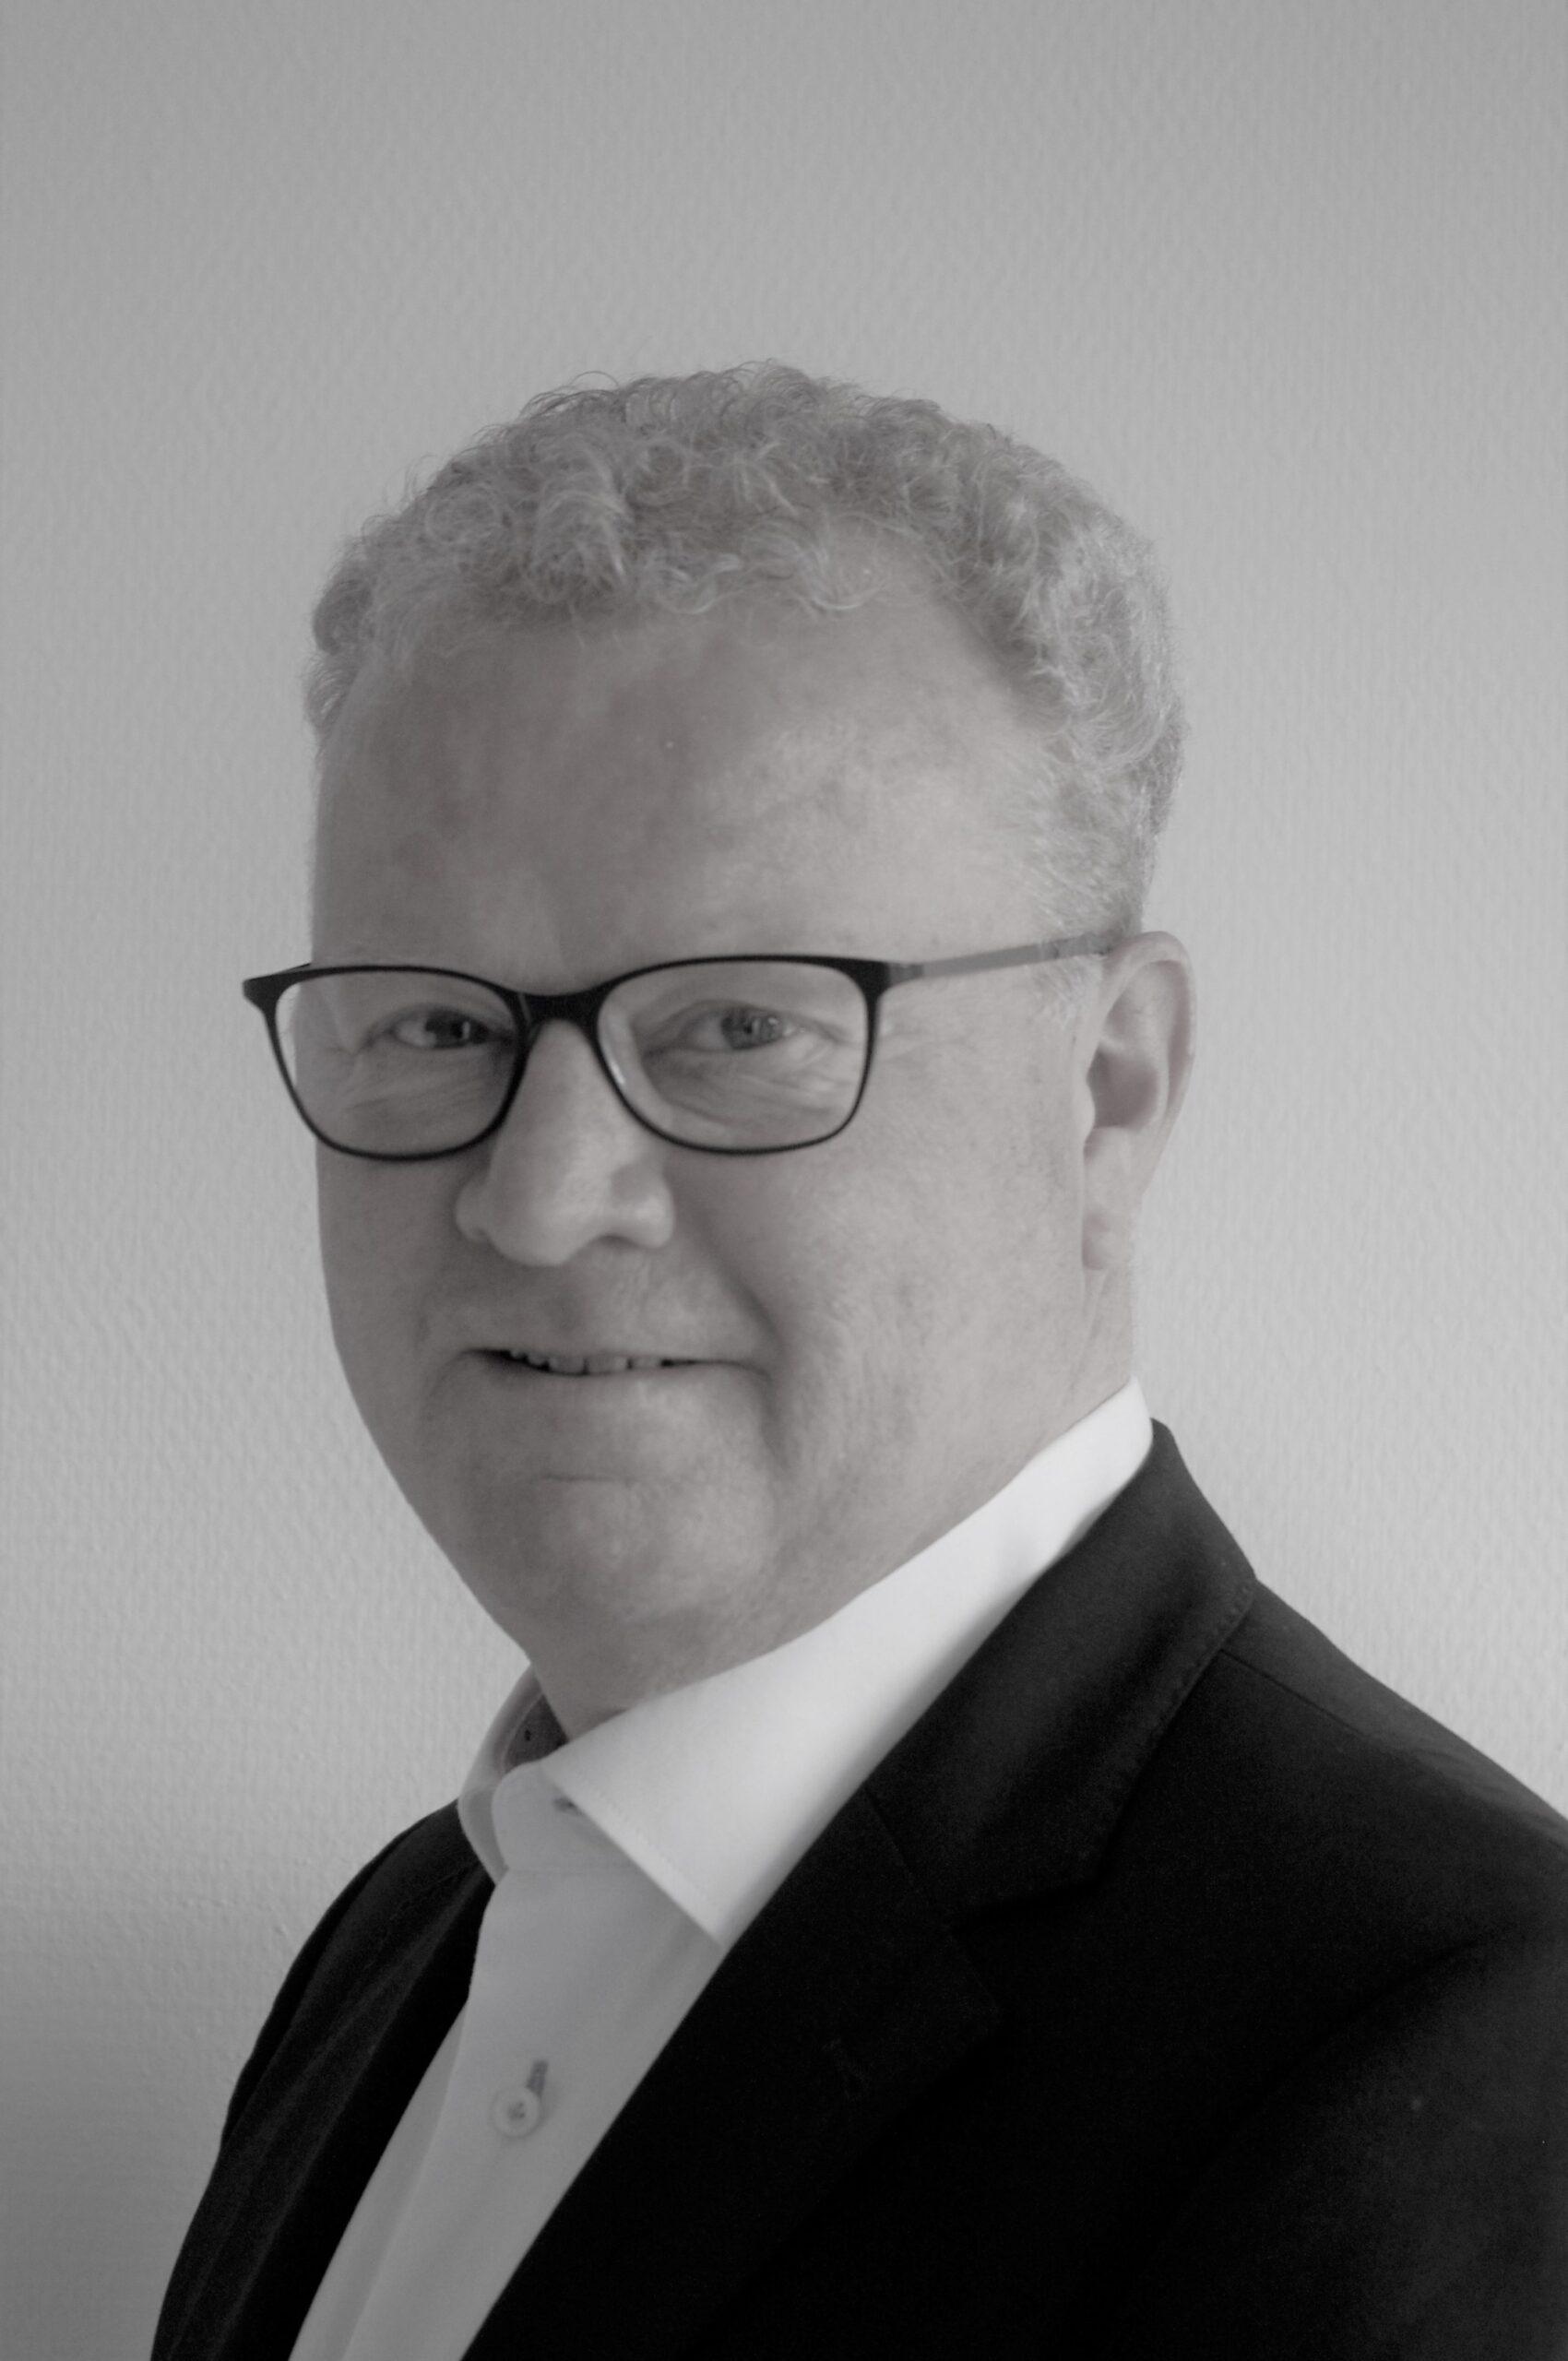 Jan Willem de Kwaadsteniet e-Power ISO 9001 ISO 14001 VCA